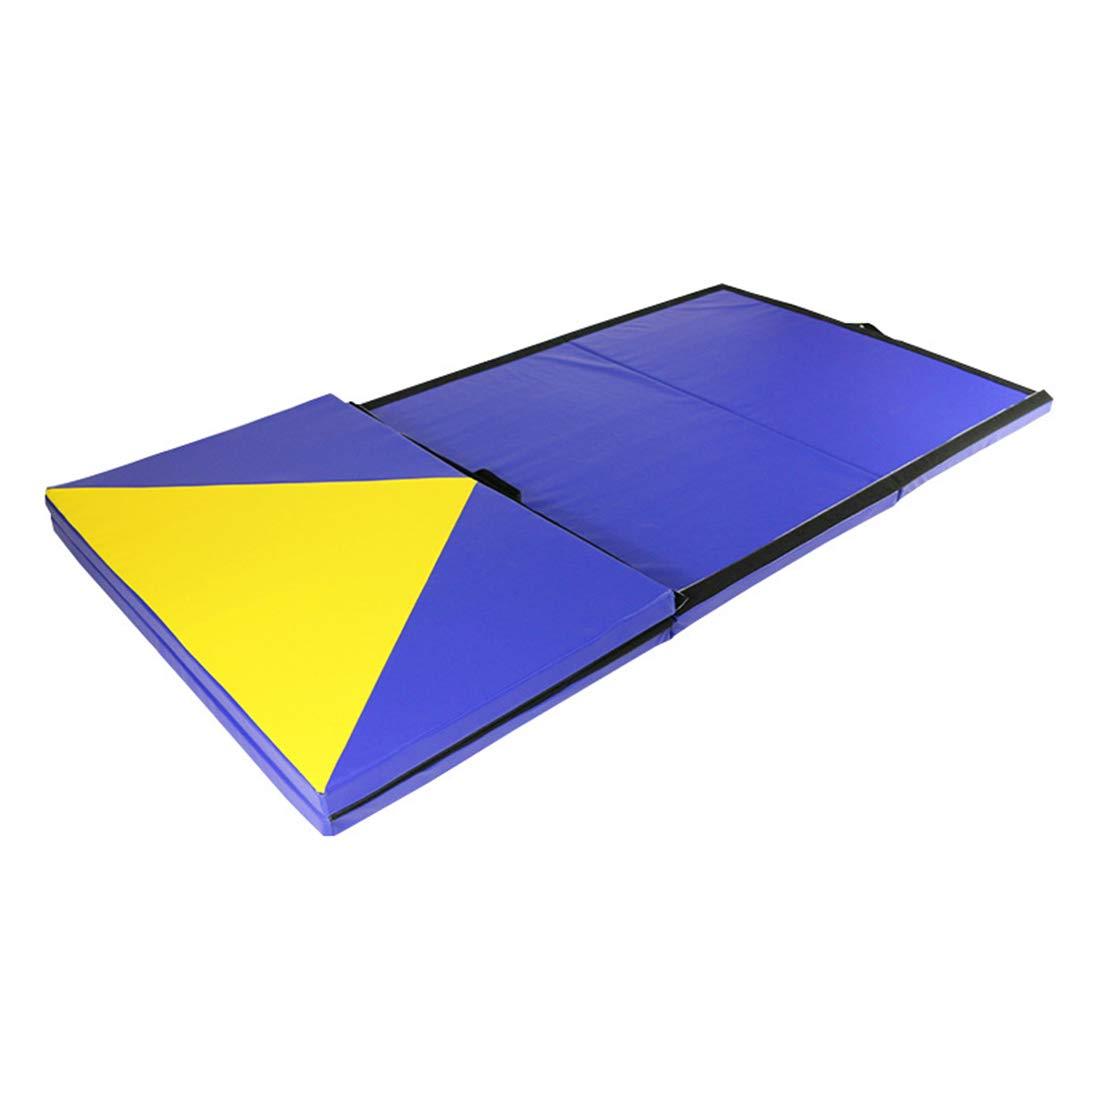 Koloeplf ダンス、練習、フィットネスのための体操クッションシットアップスポンジマットヨガマット (Color : ブルー)  ブルー B07MR19QL5